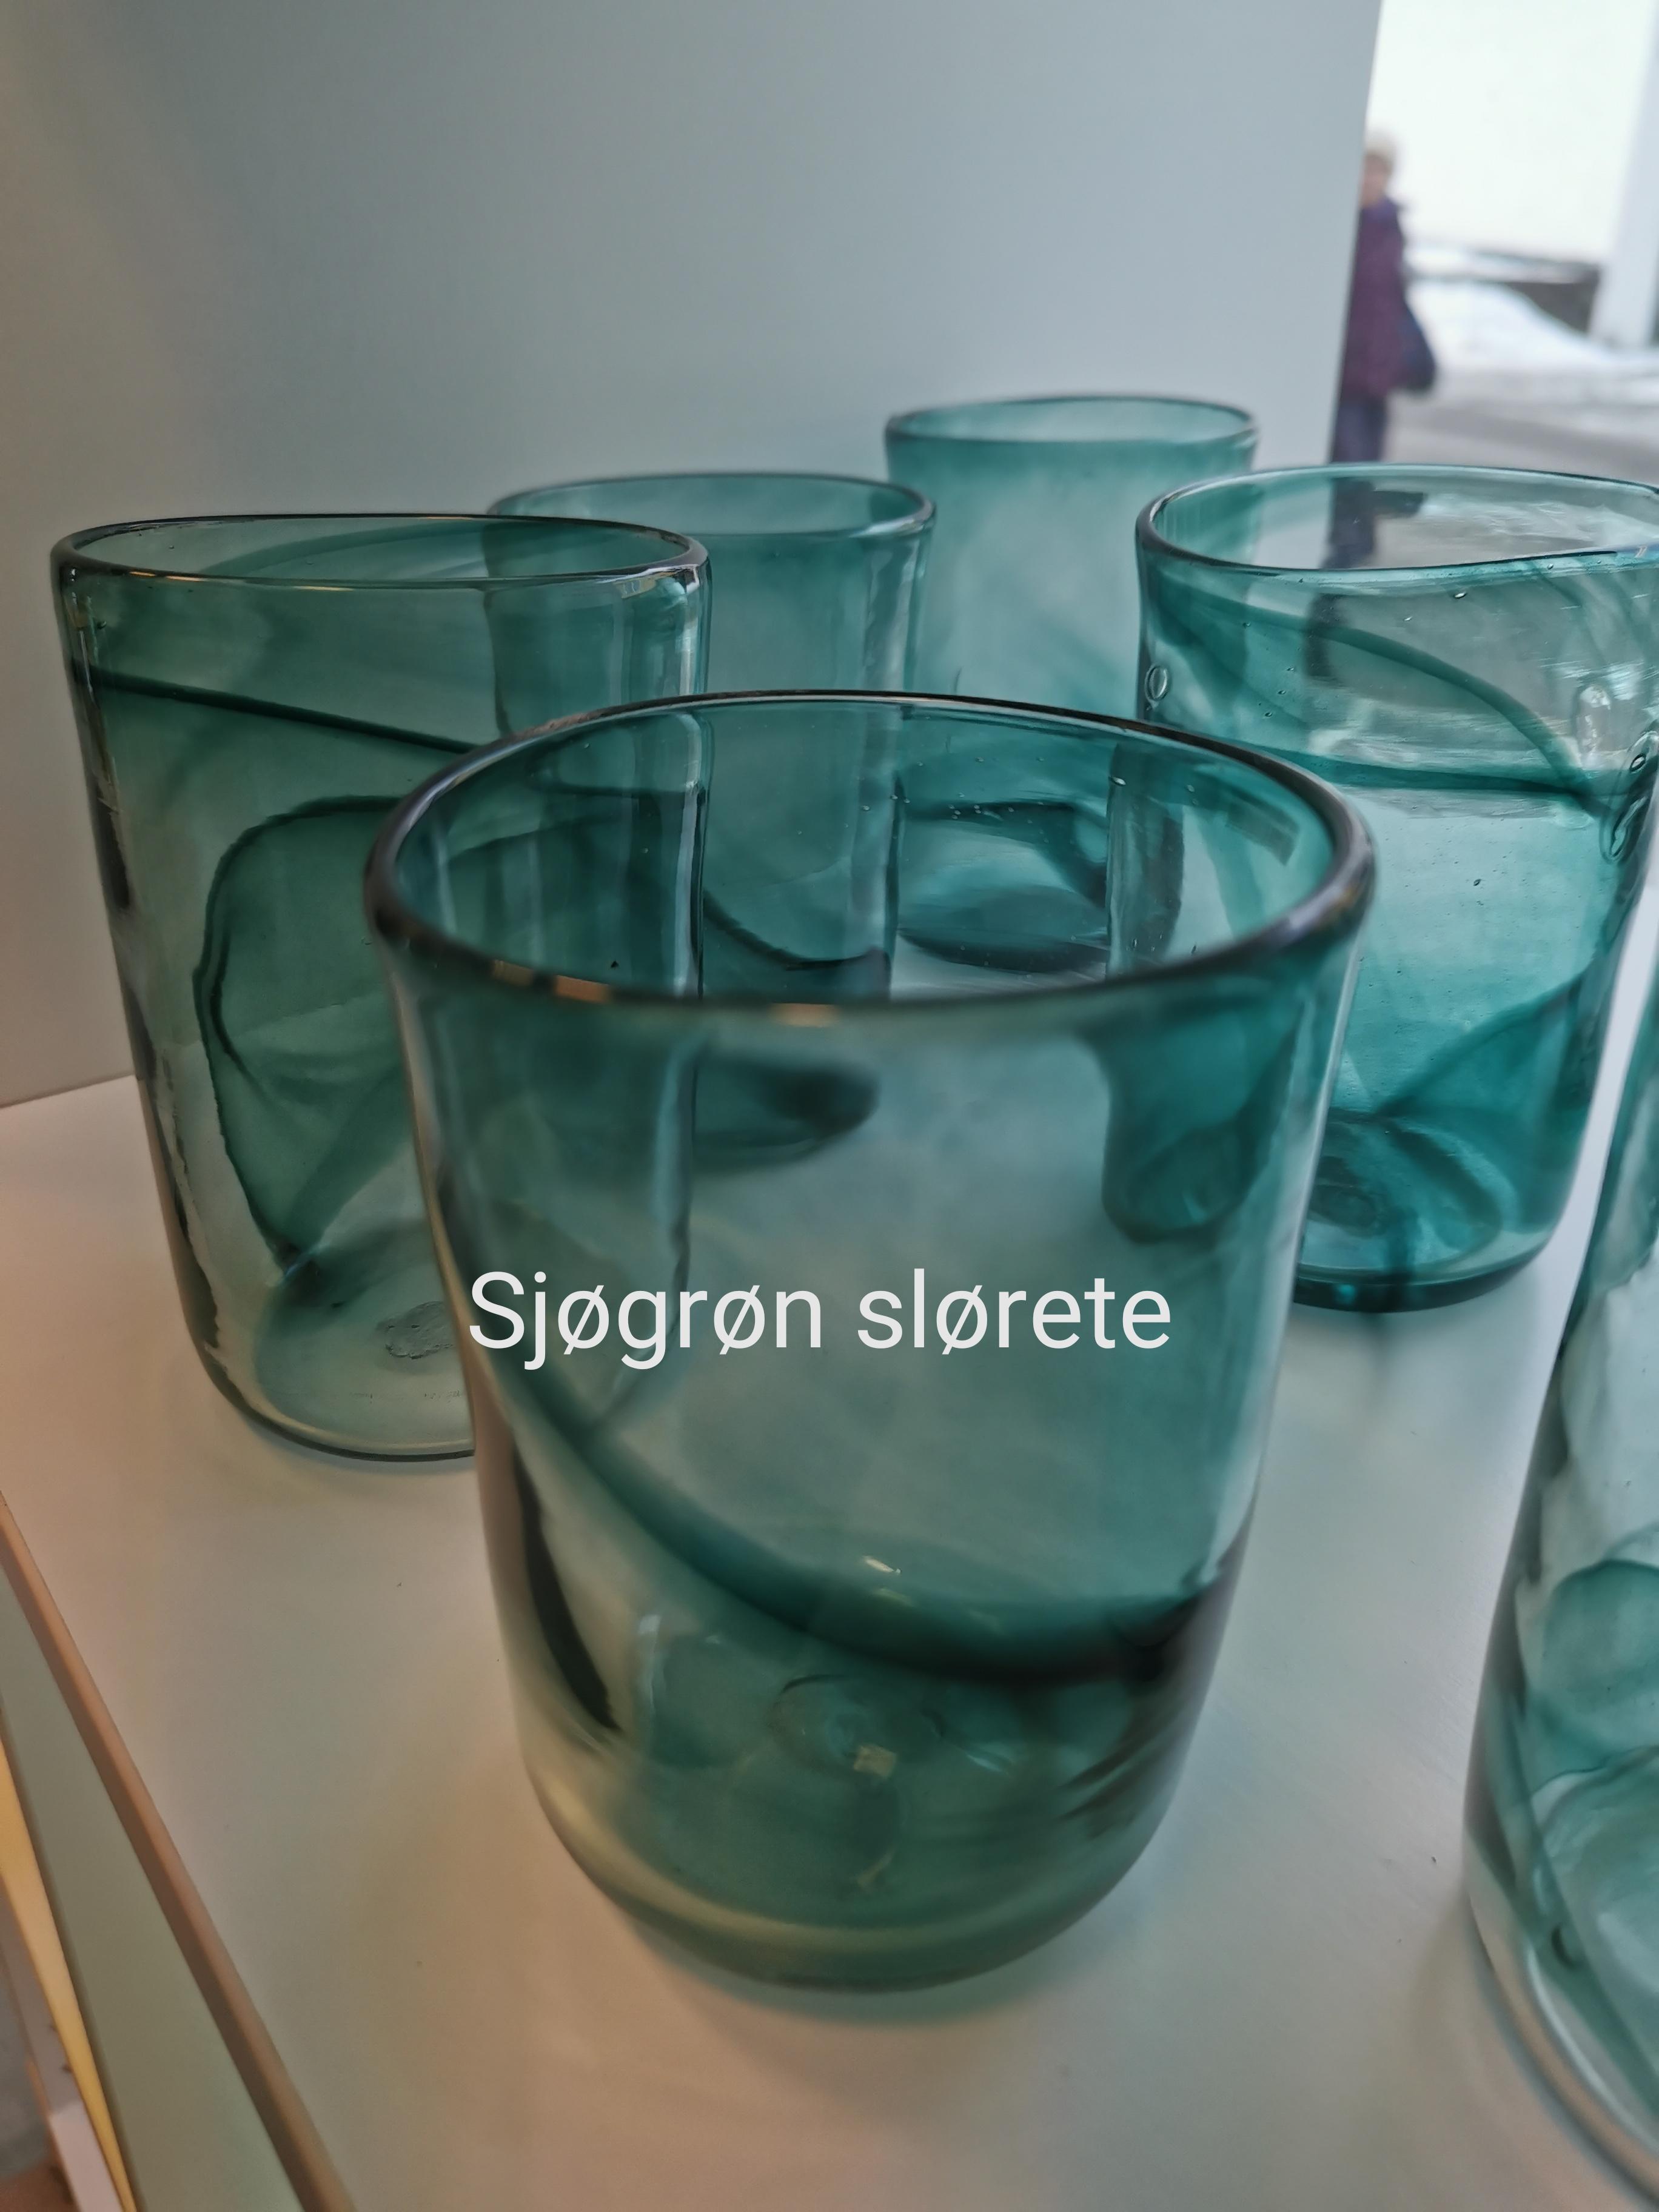 Kjøkenglas slørete